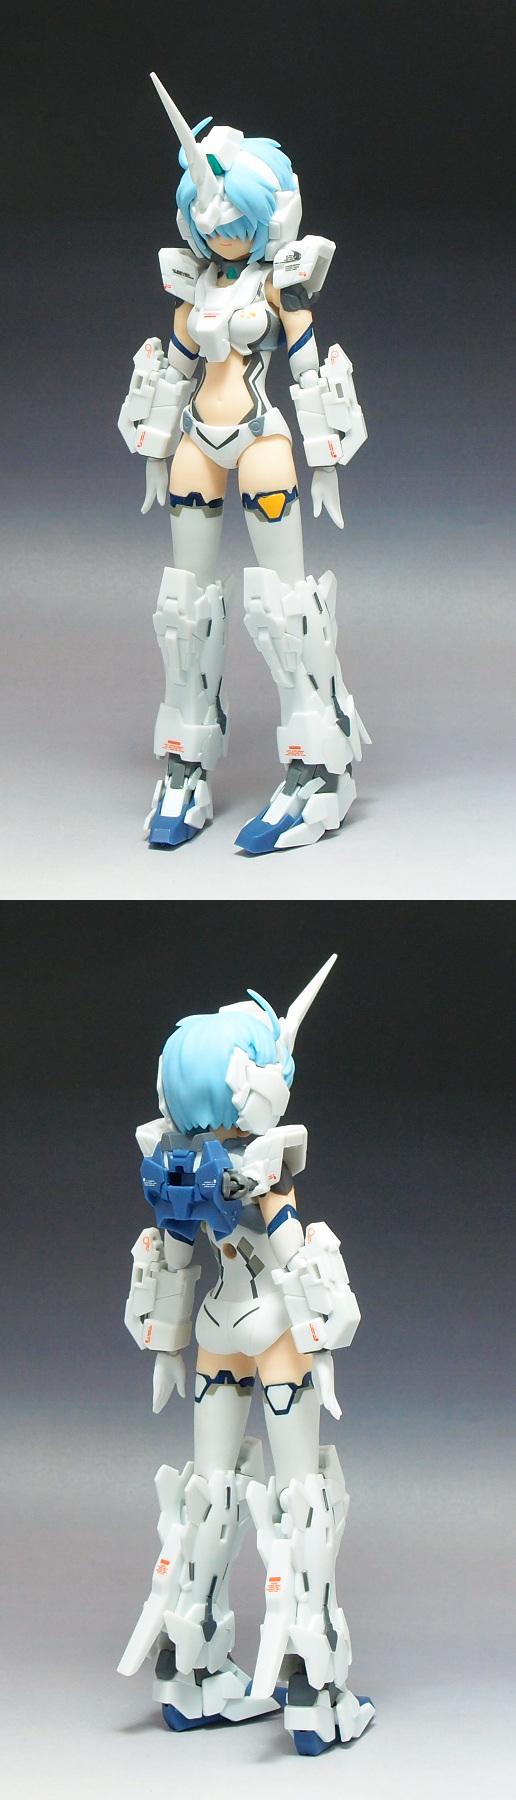 AGP_MSgirl_unicorn.jpg